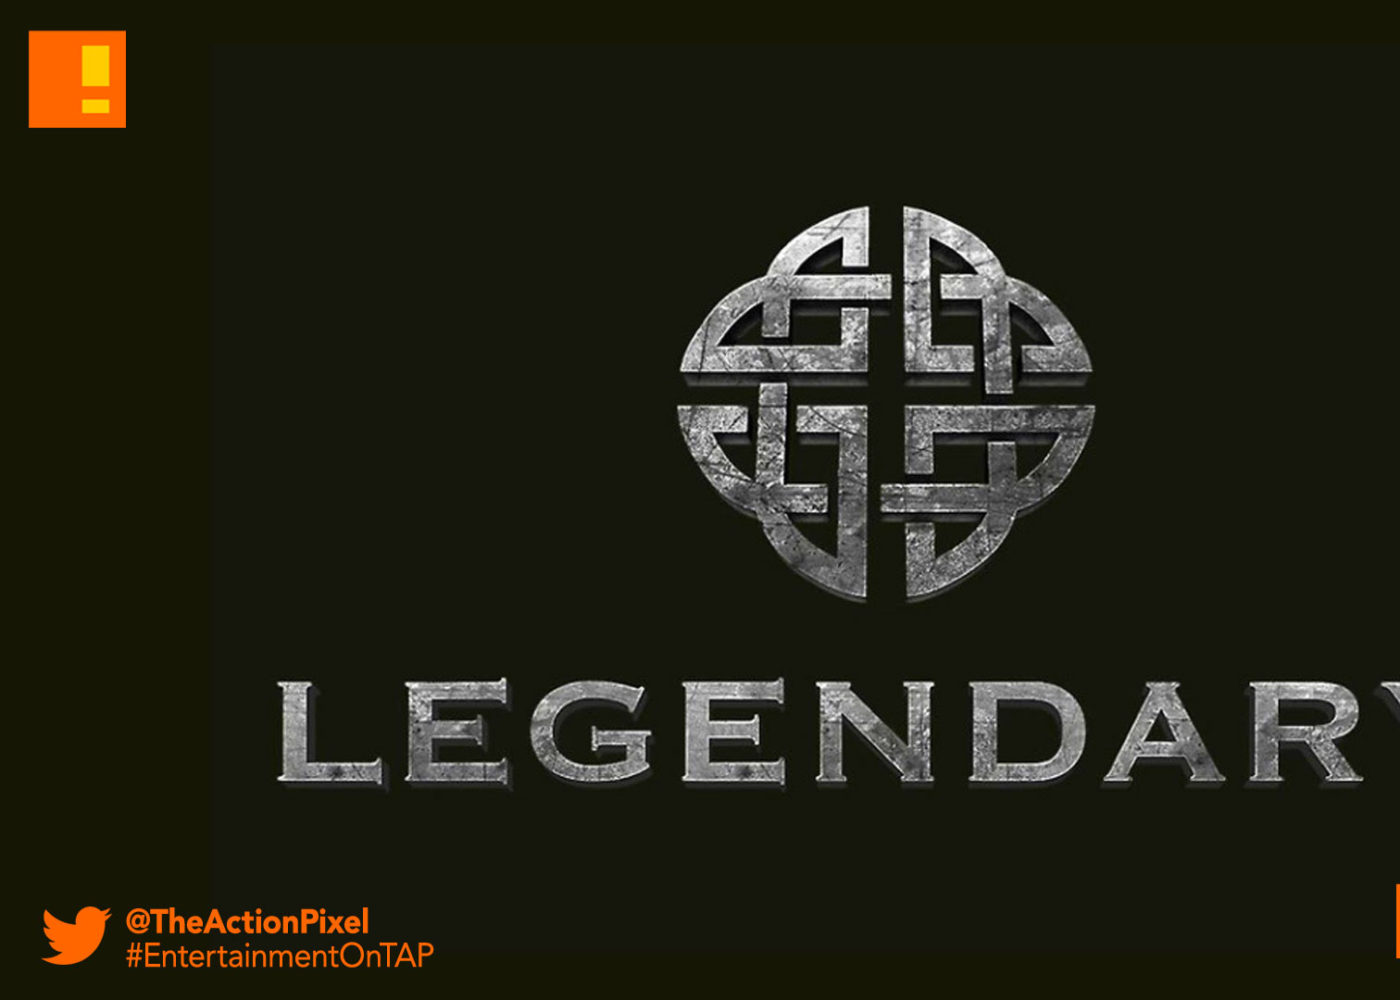 legendary, nonplayer, nate simpson, Legendary Entertainment, entertainment on tap, the action pixel